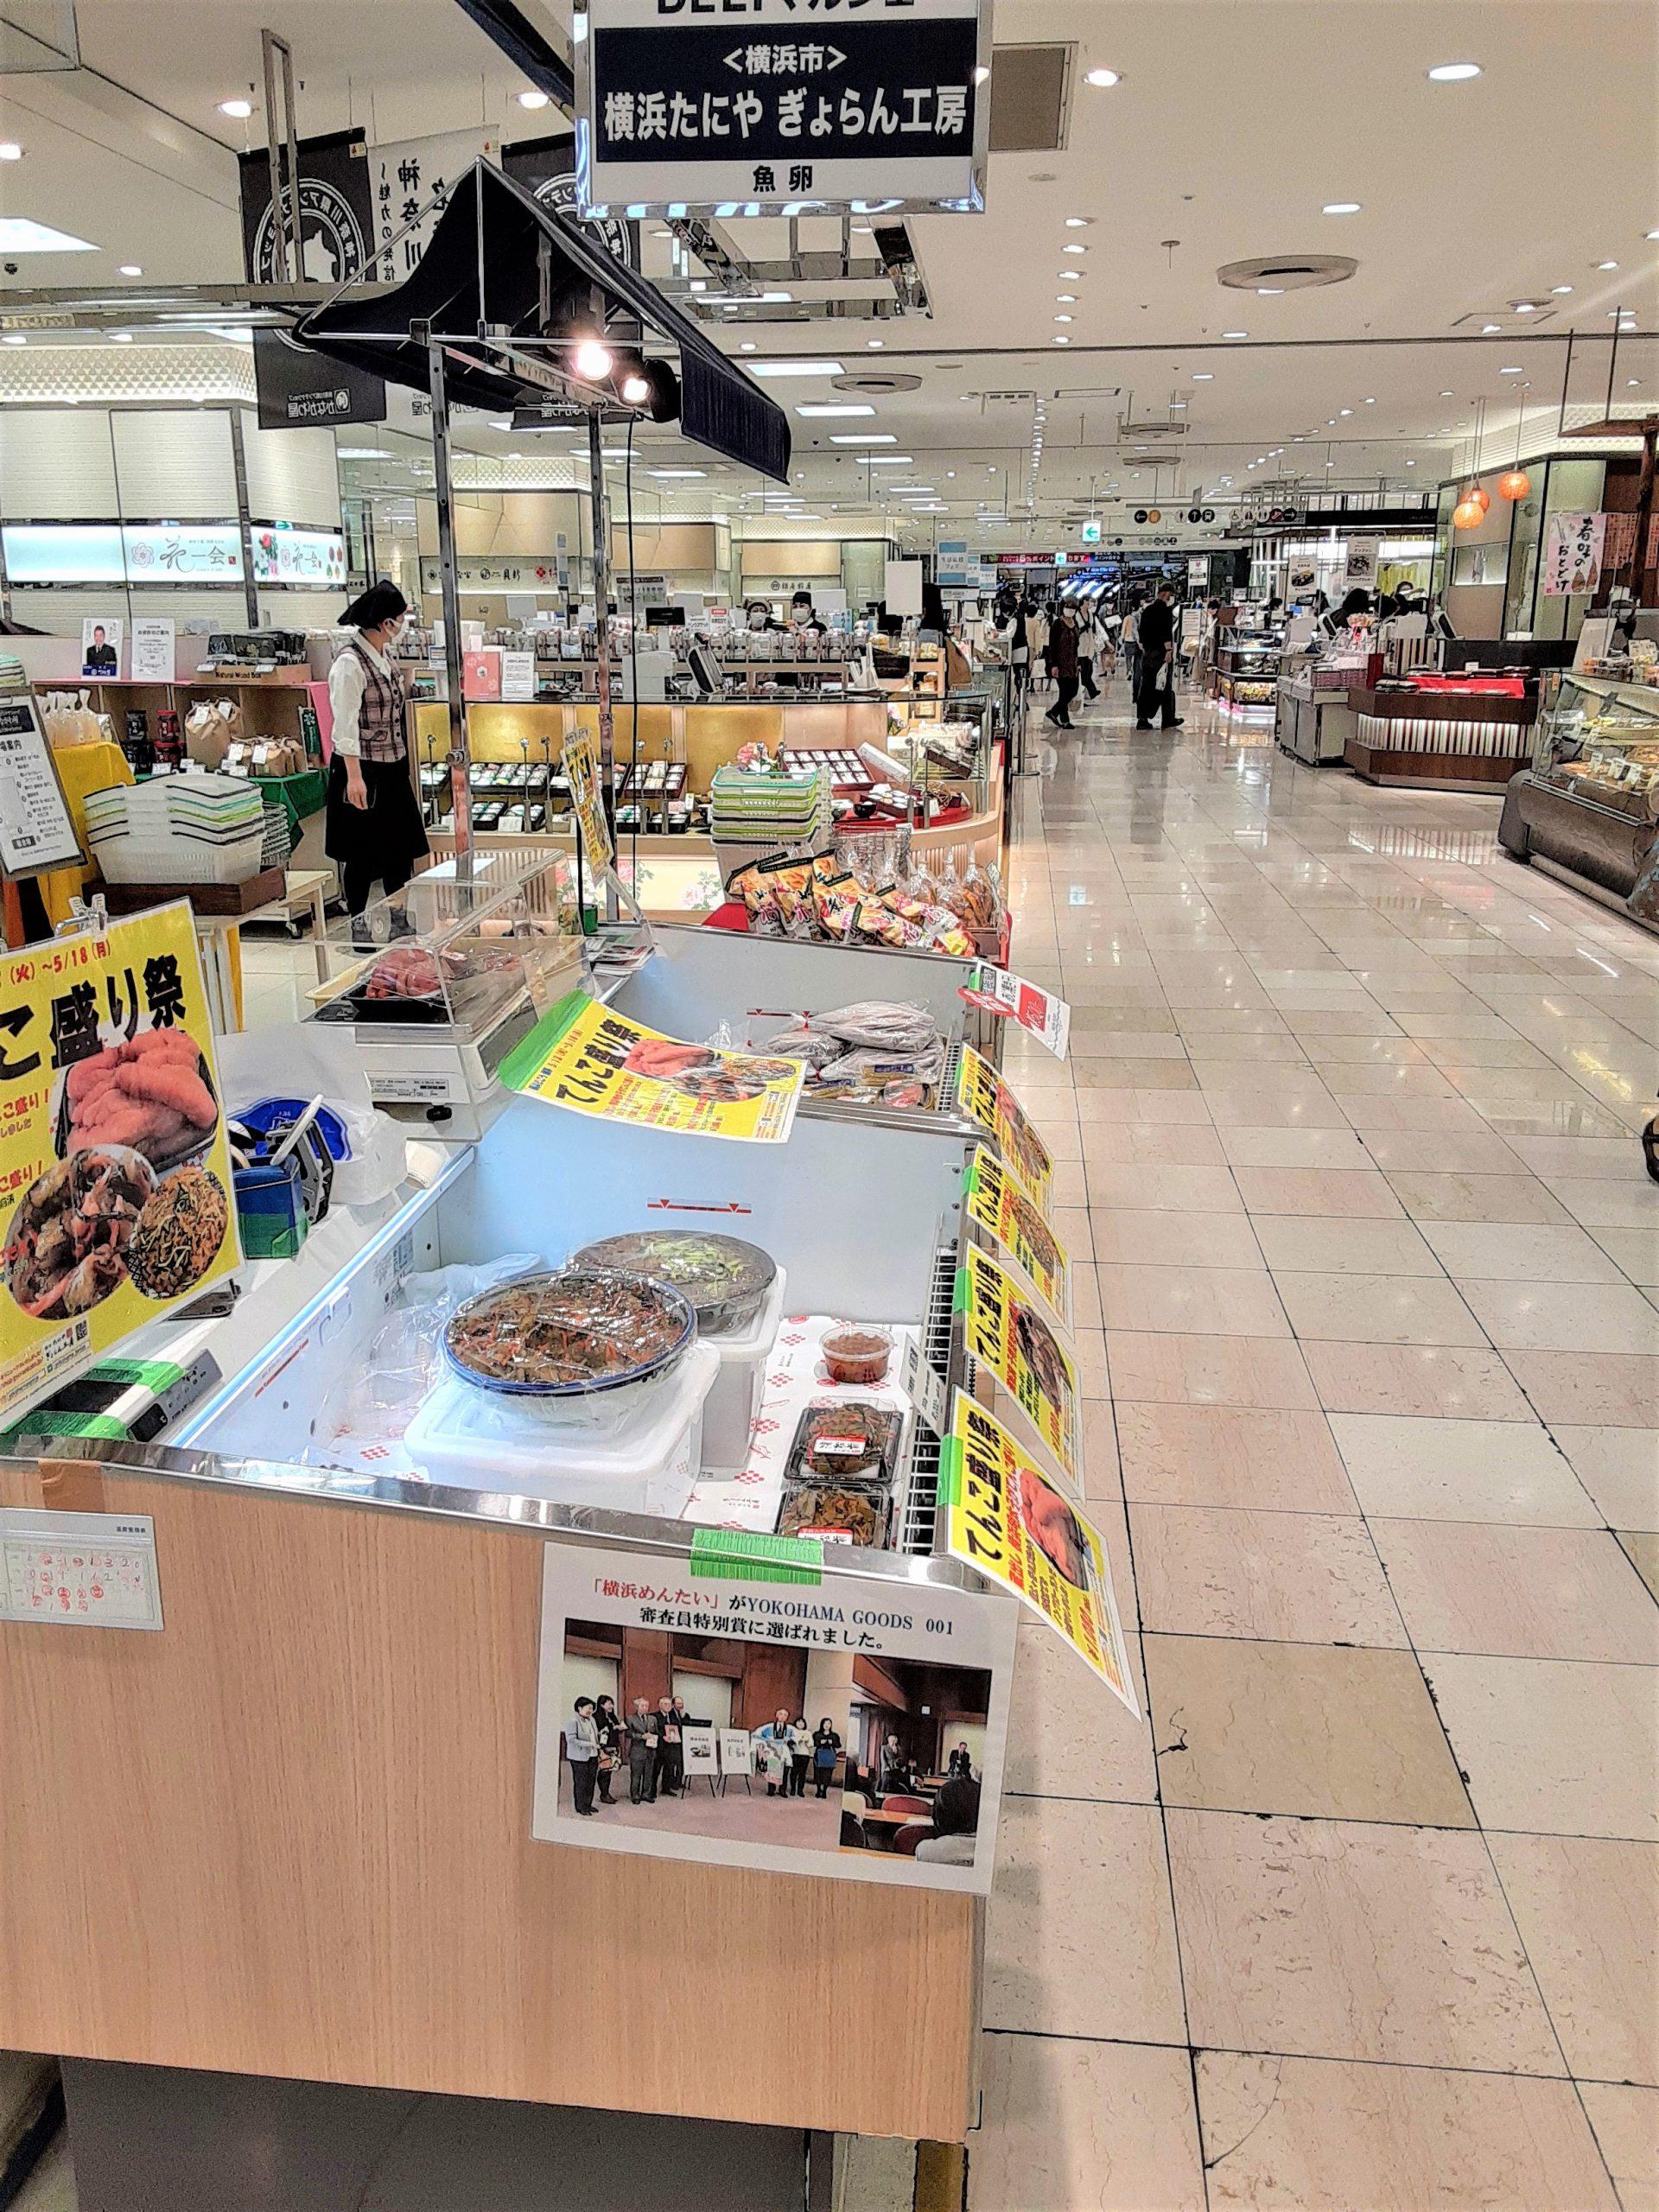 https://shop.gyorankobo.jp/wp-content/uploads/2020/11/ツイッター資料_そごう横浜店催事2020.5-2-scaled.jpg